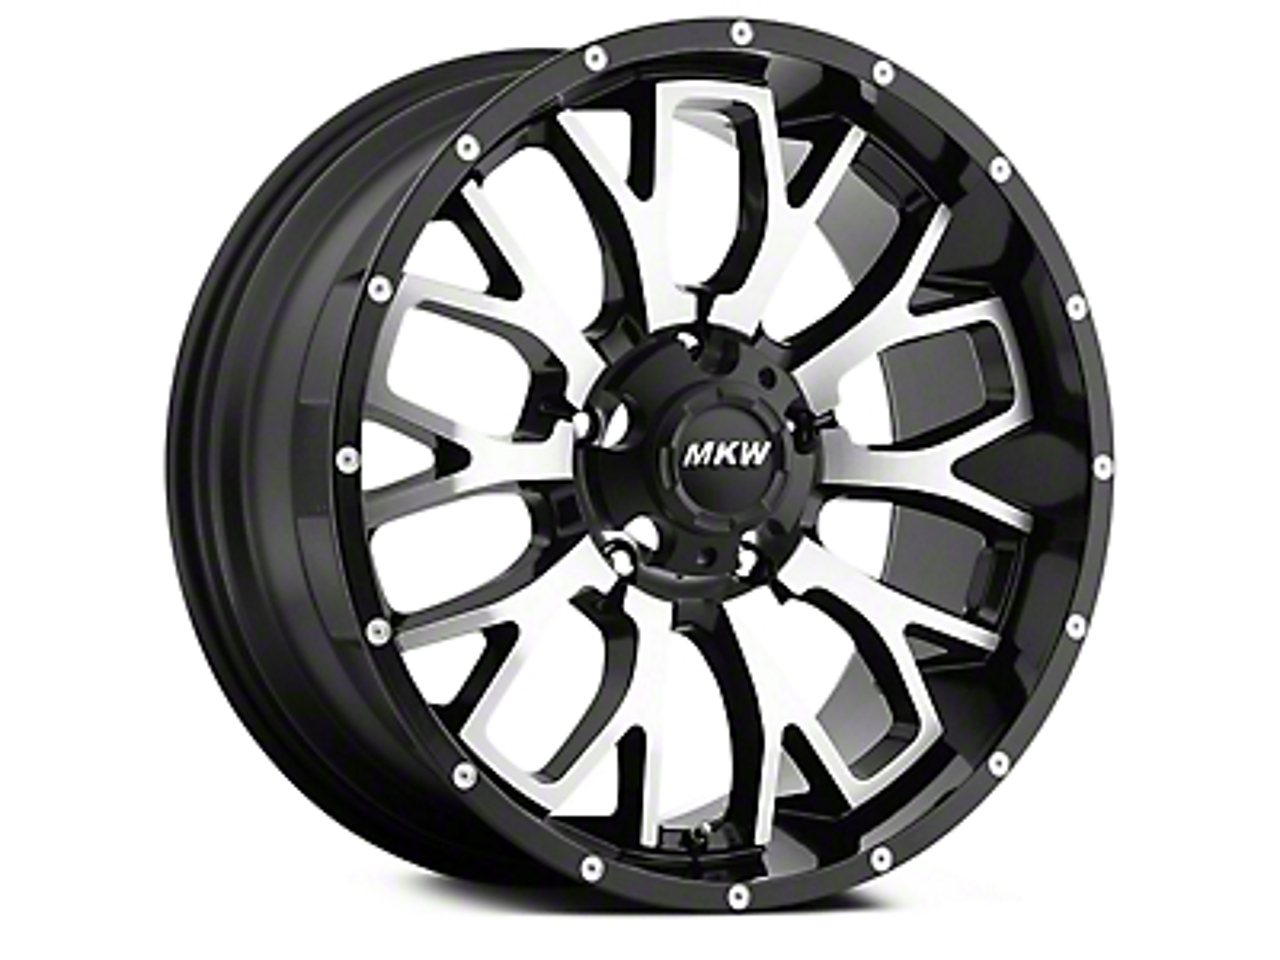 MKW Offroad M95 Satin Black Machined 6-Lug Wheel - 20x9 (04-18 All)